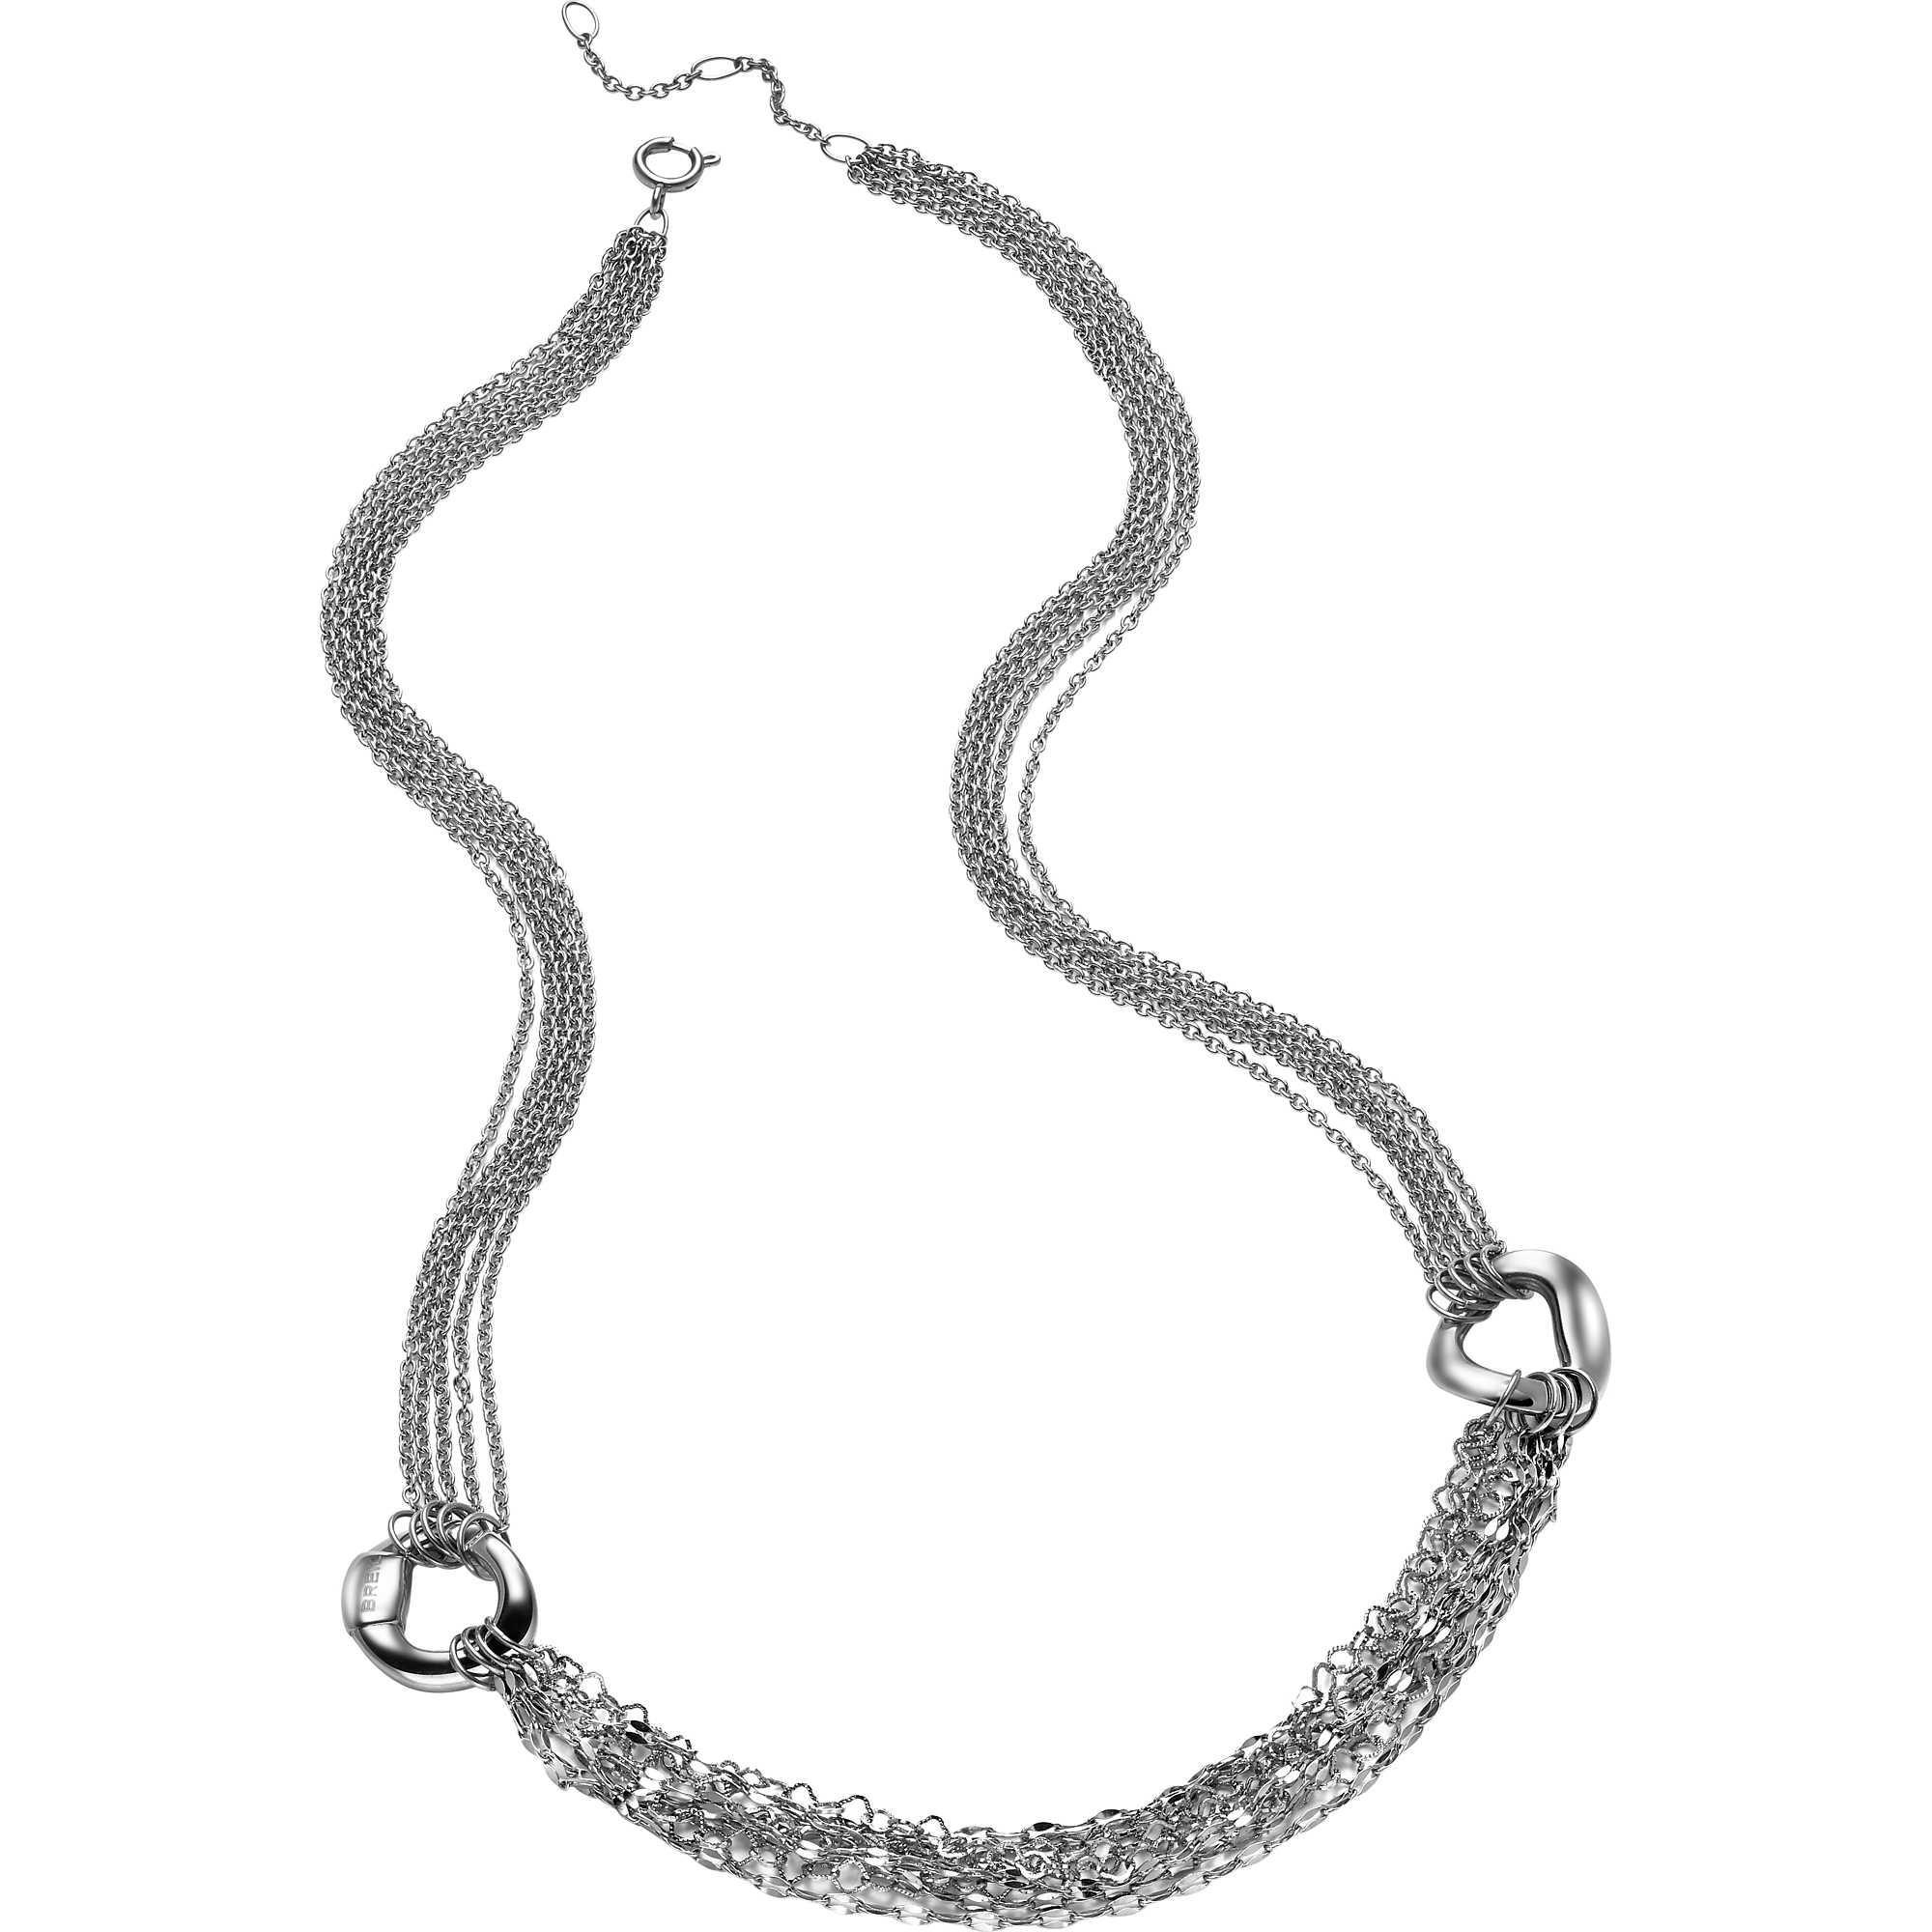 BREIL-Collana da donna in acciaio